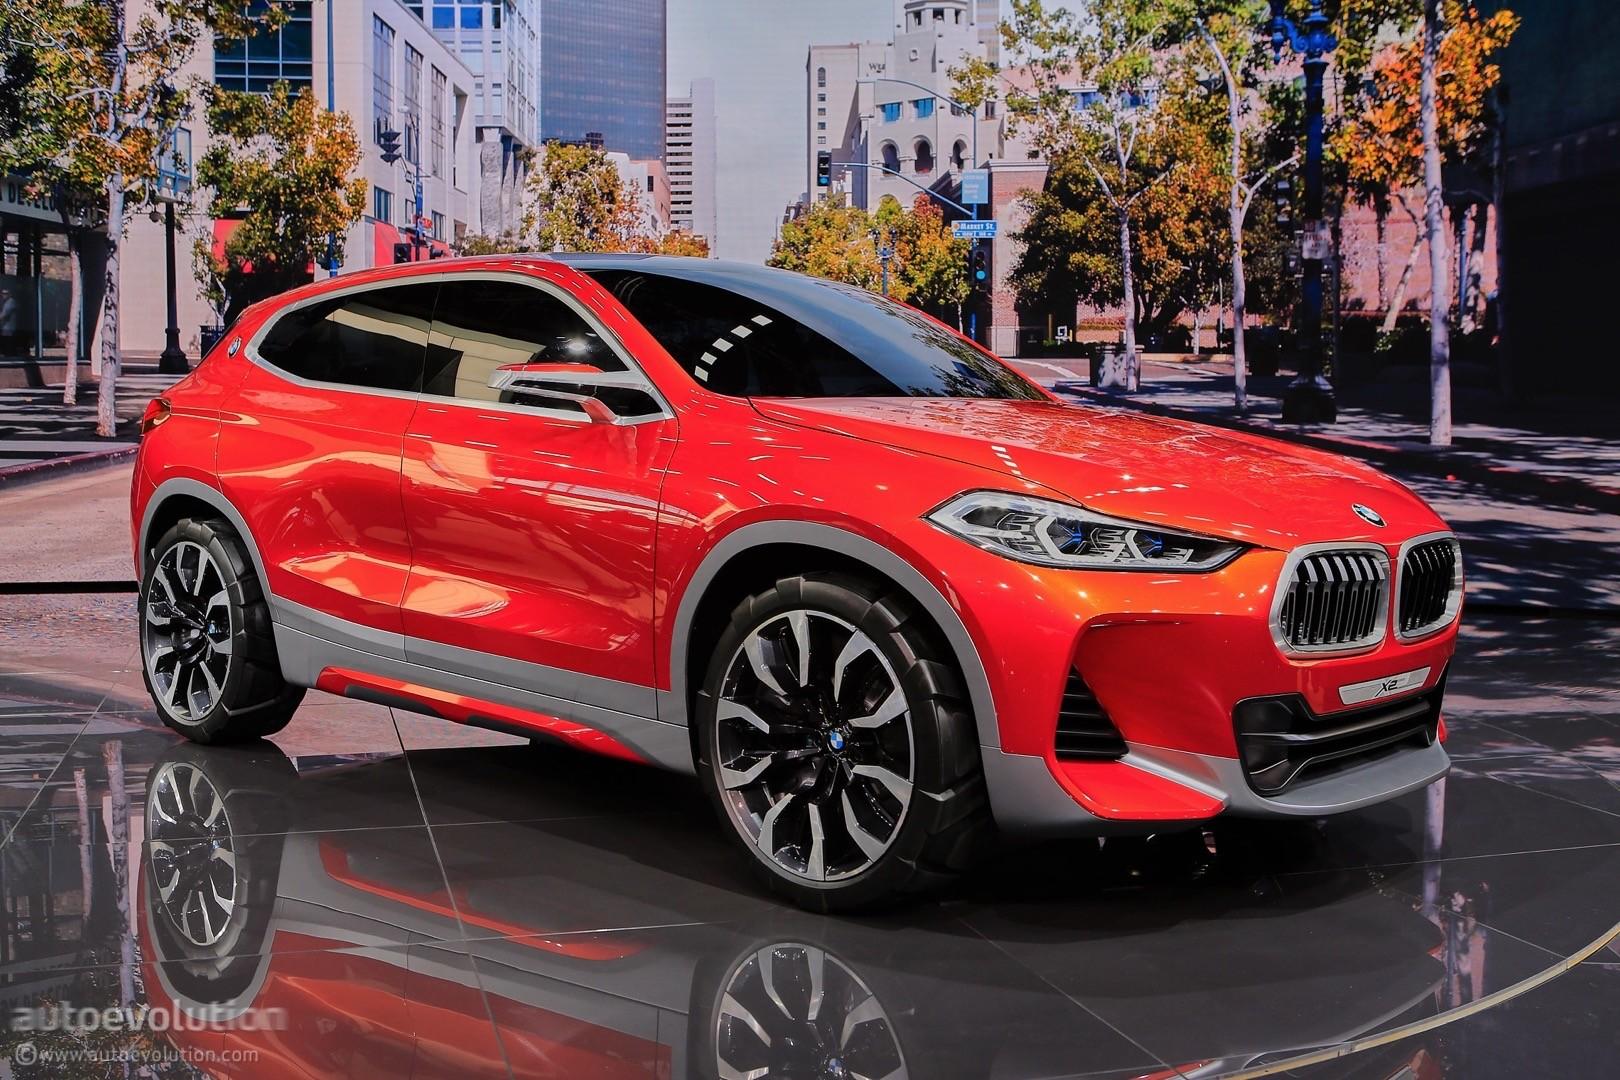 porsche suv 2018 red. BMW Concept X2 (previews 2017 F39 X2) Live At 2016 Paris Motor Show Porsche Suv 2018 Red U